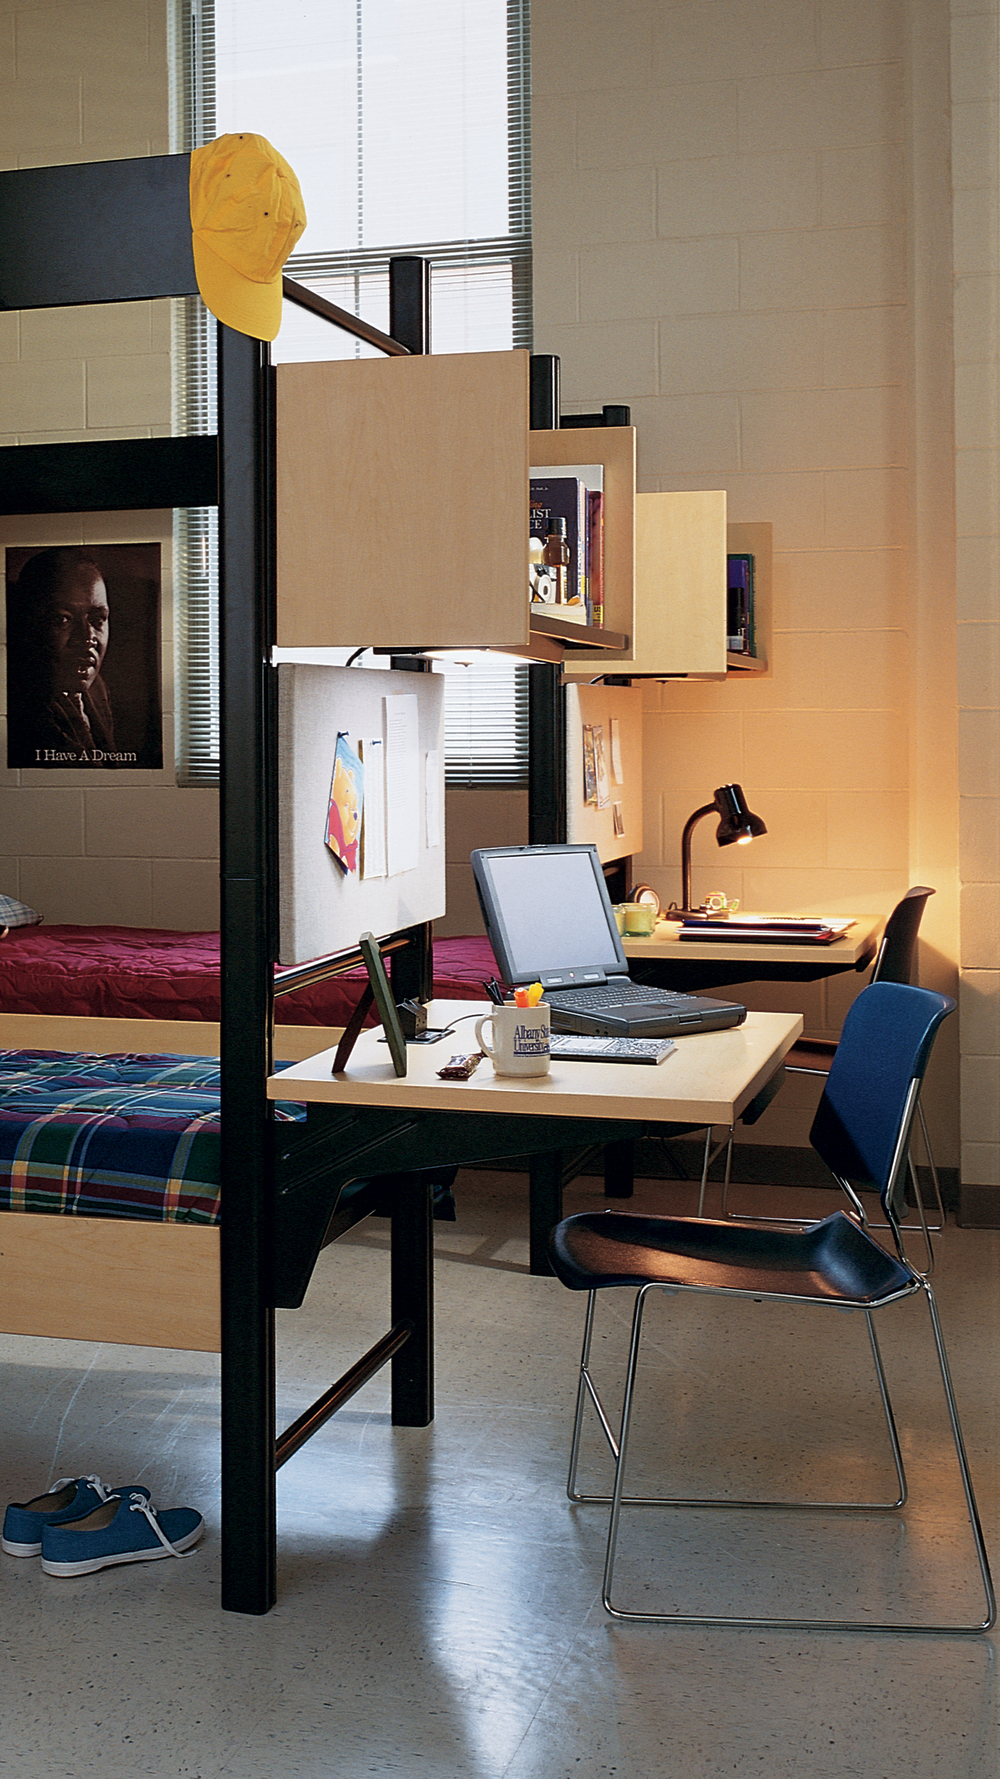 AlbSt_housing_RoomSc2.jpg